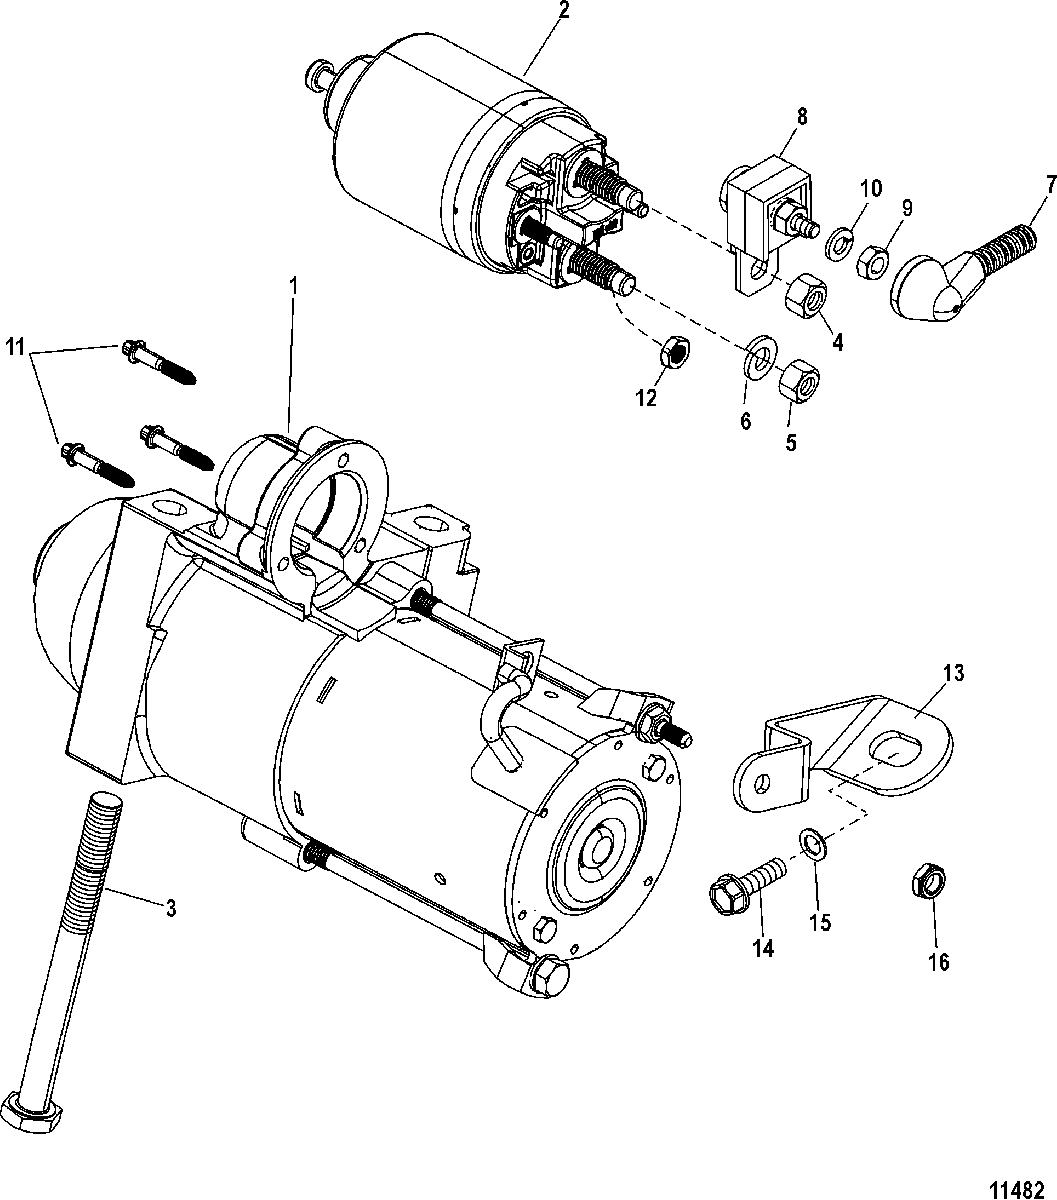 Crusader Engine Starter Wiring Diagram | Best Wiring Library - Mercruiser 3.0 Wiring Diagram